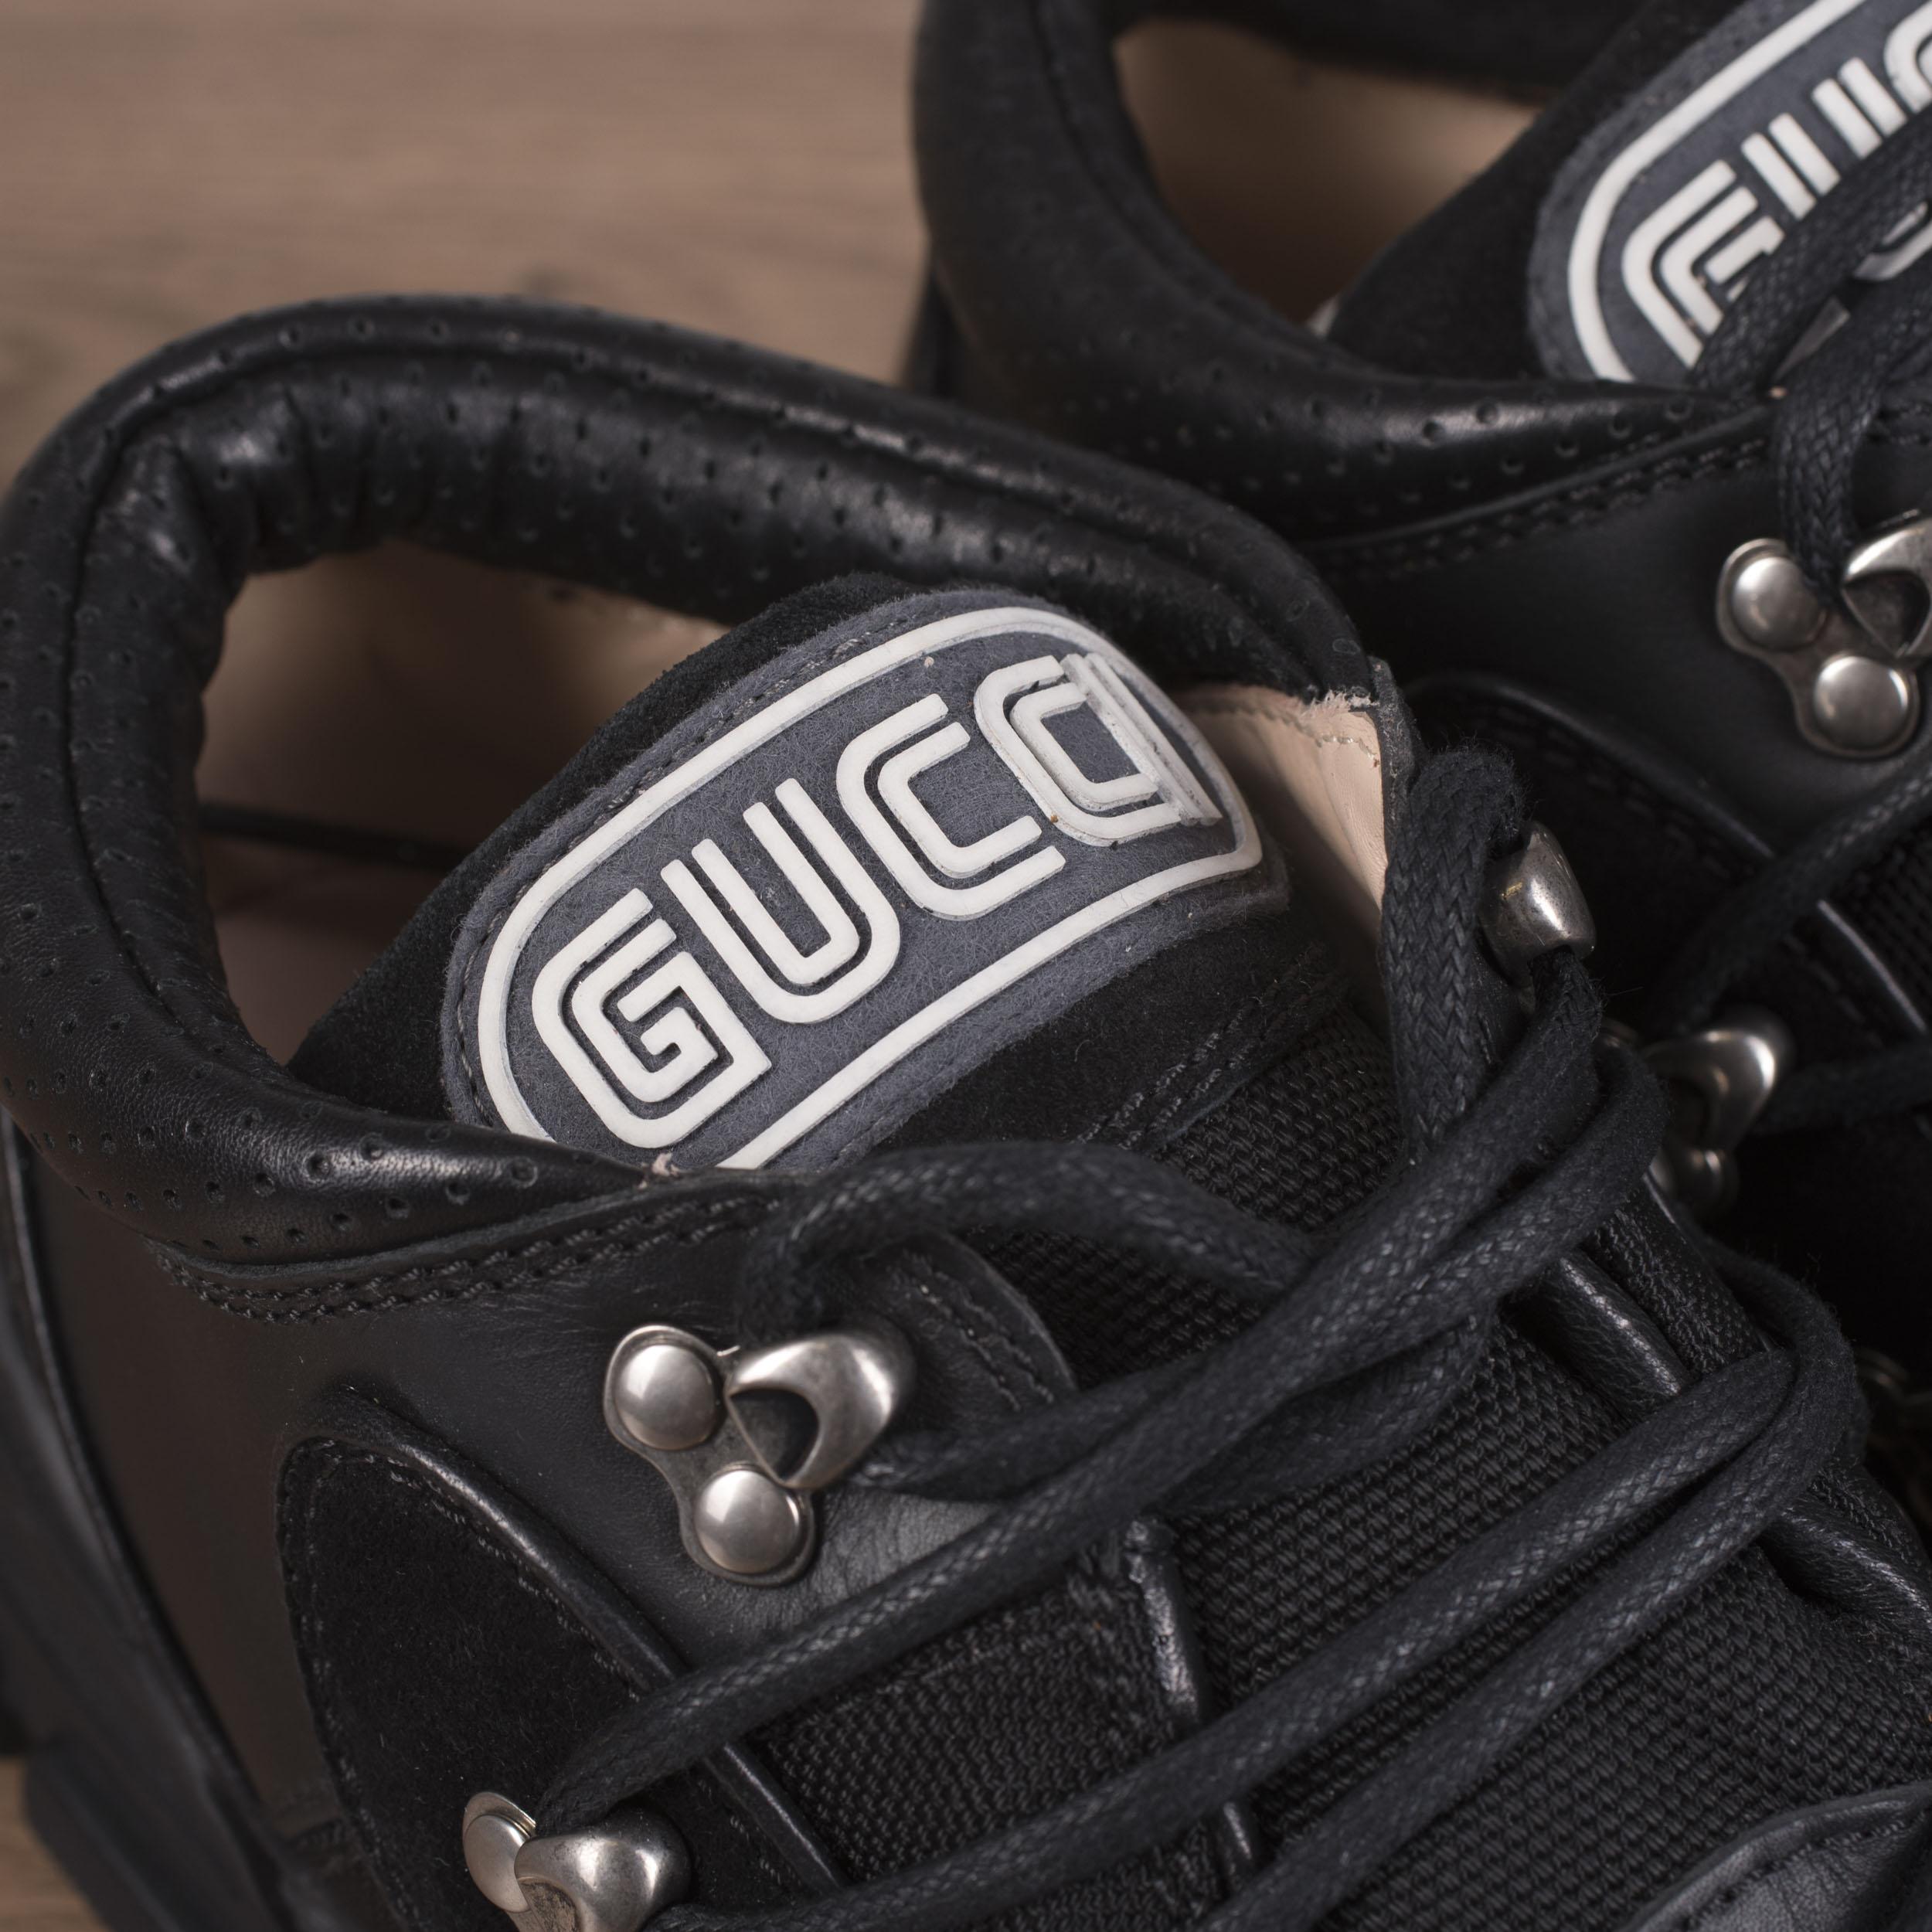 8c49b08ea GUCCI x SEGA 980$ Flashtrek Sneakers In Black Canvas, Leather ...